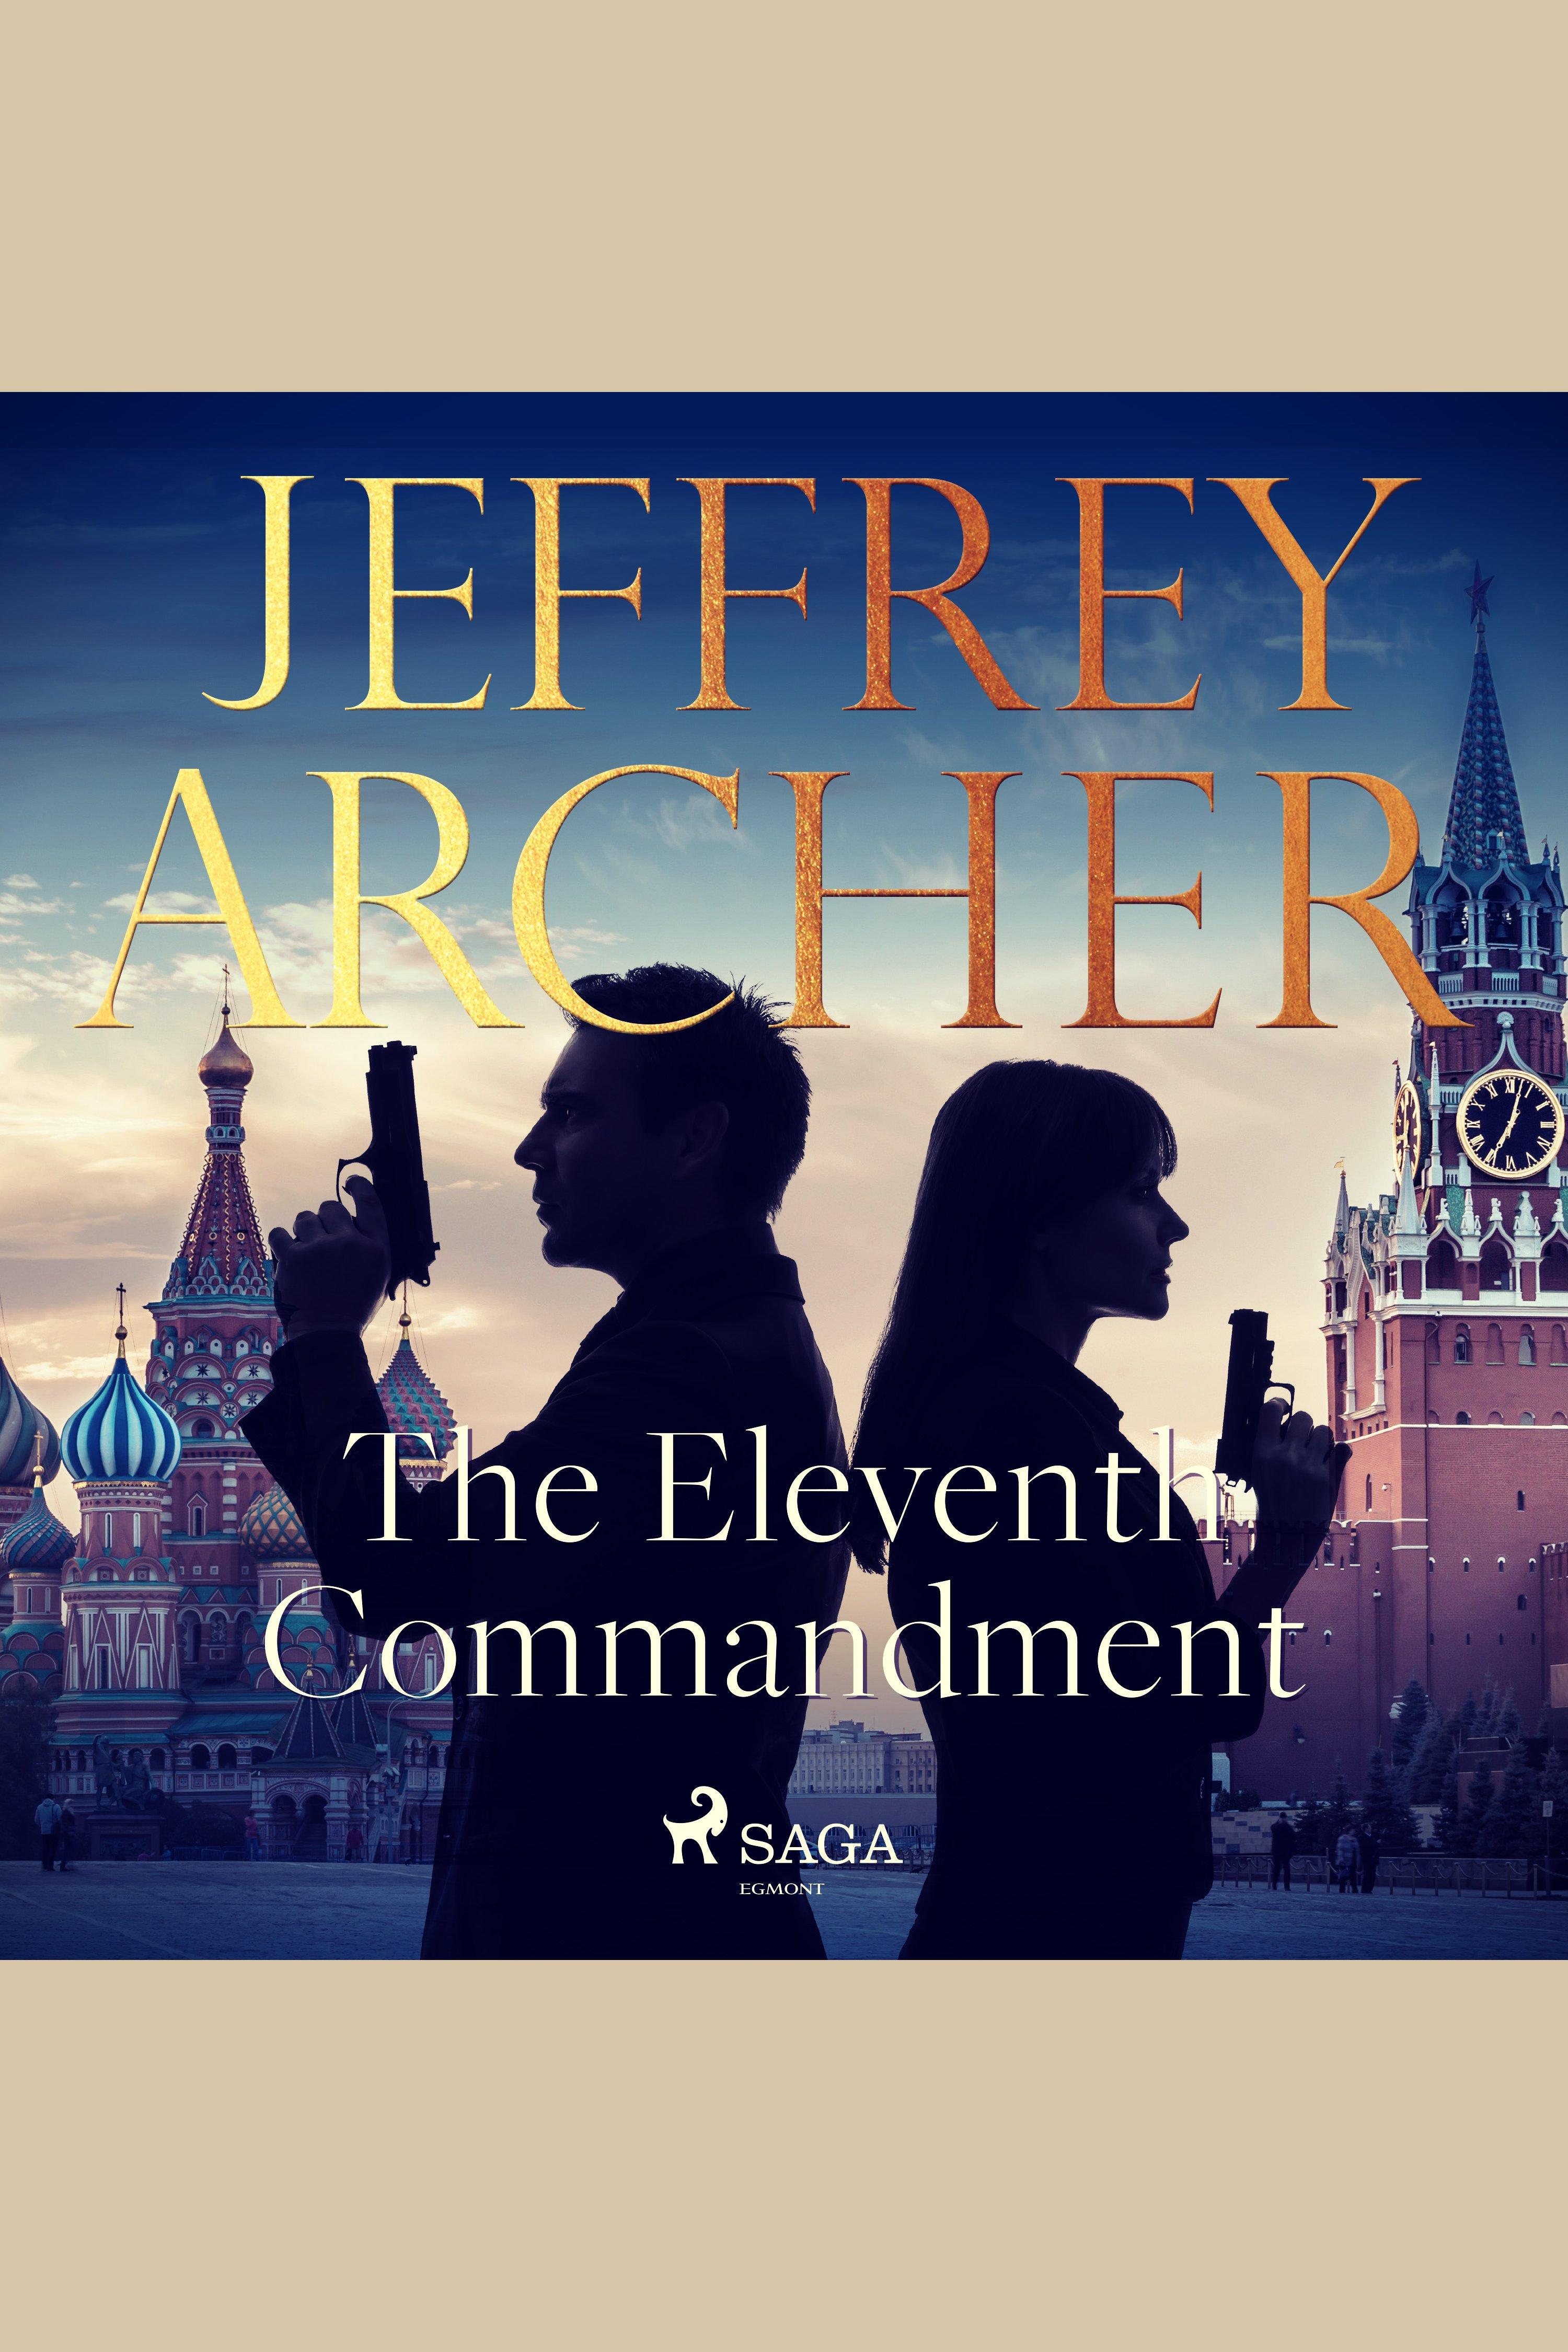 Eleventh Commandment, The